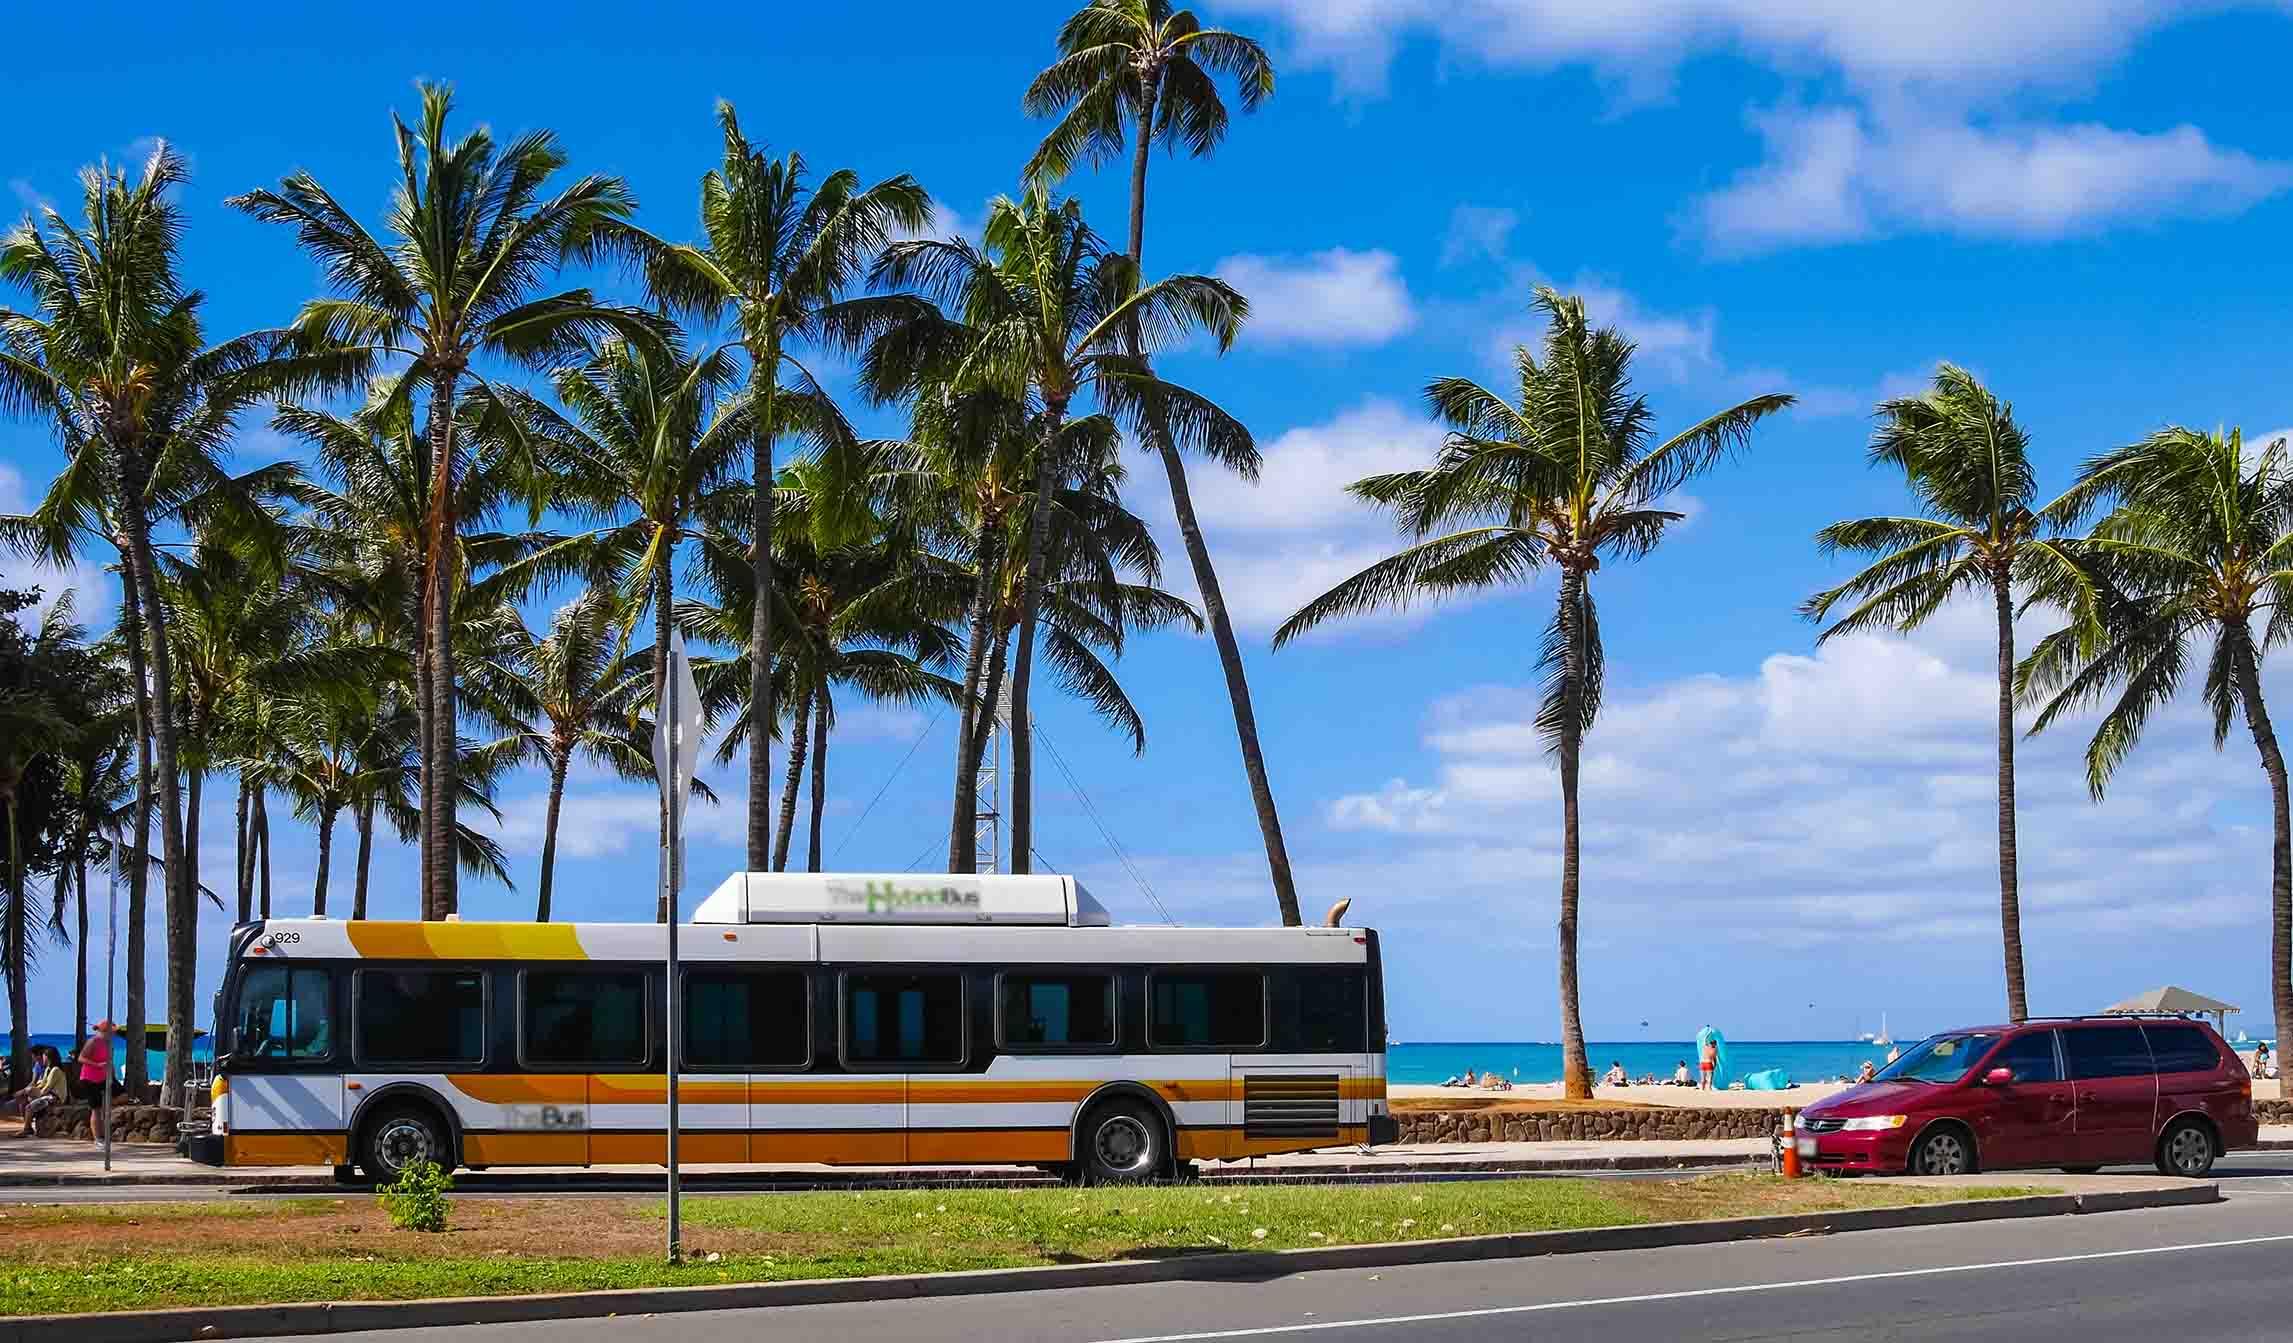 Honolulu stantec transit analysis